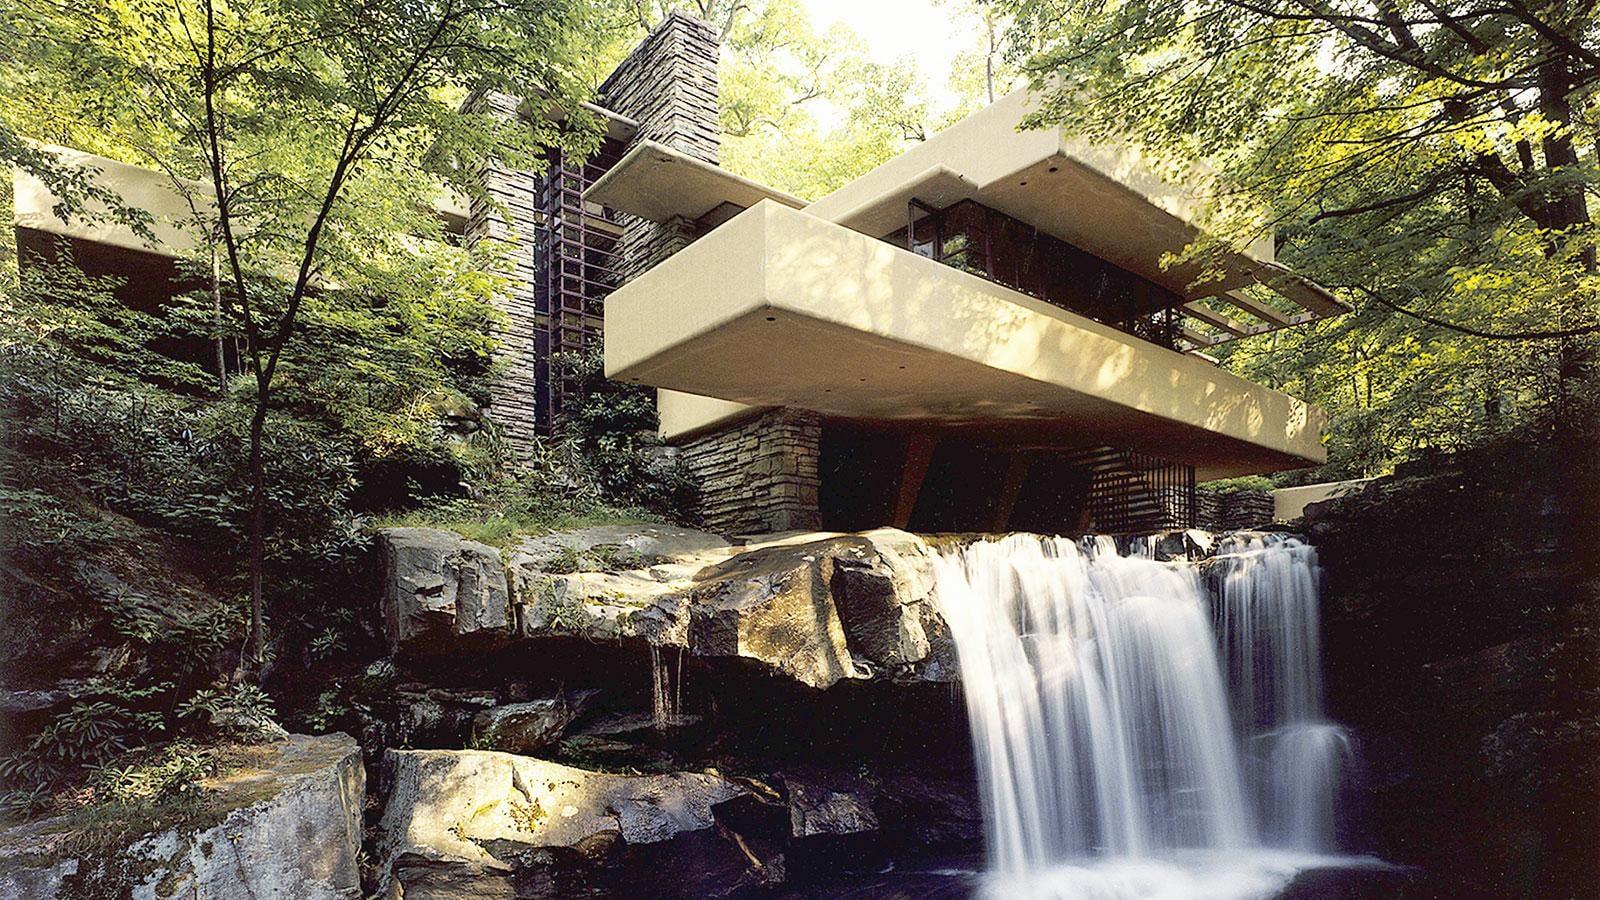 photo credit to Western Pennsylvania Conservancy